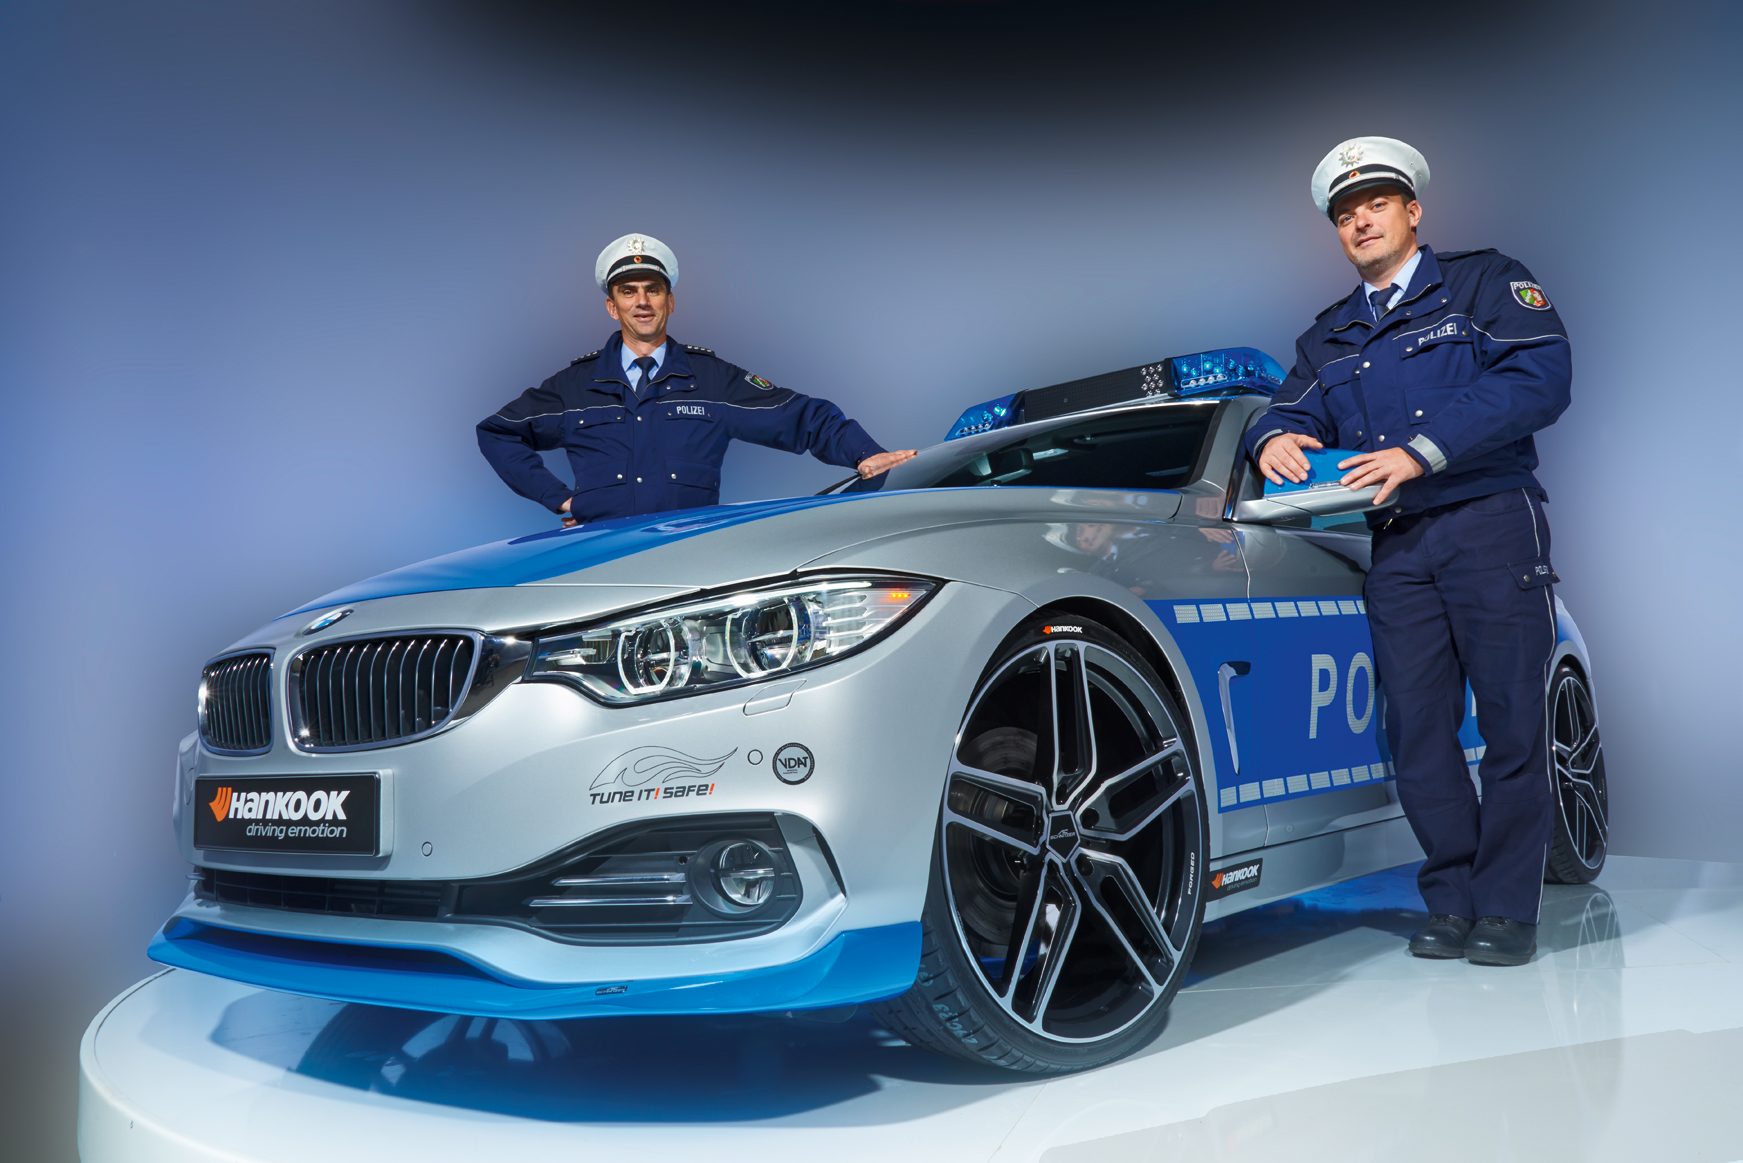 AC Schnitzer BMW 428i Police Coupe photo #1